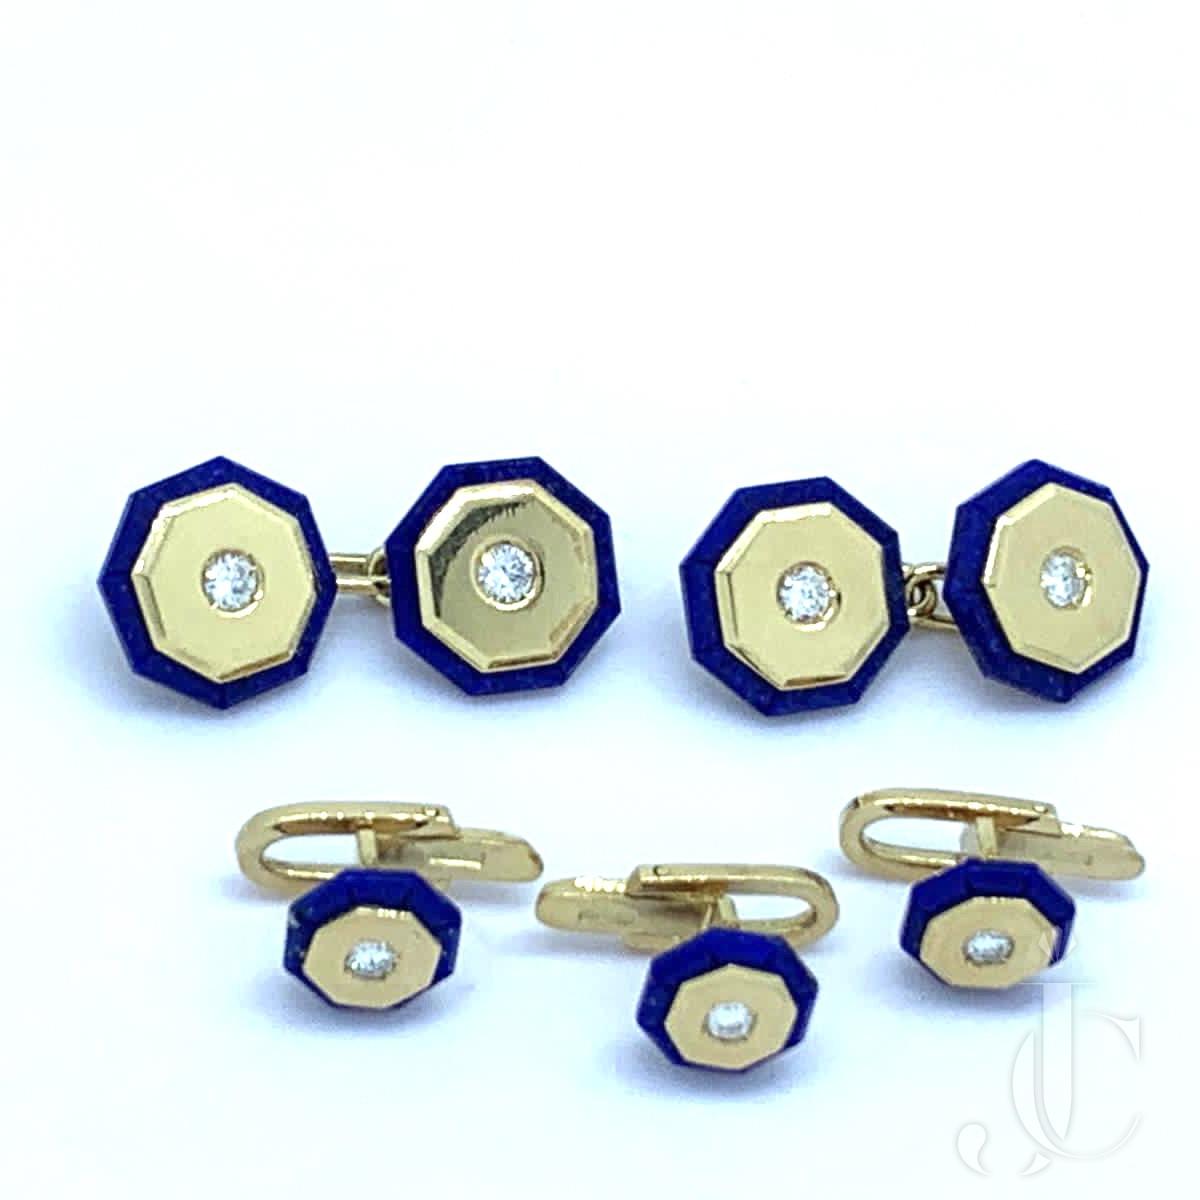 18k Italian gold,lapis and diamond cufflink and studs set. Italian,